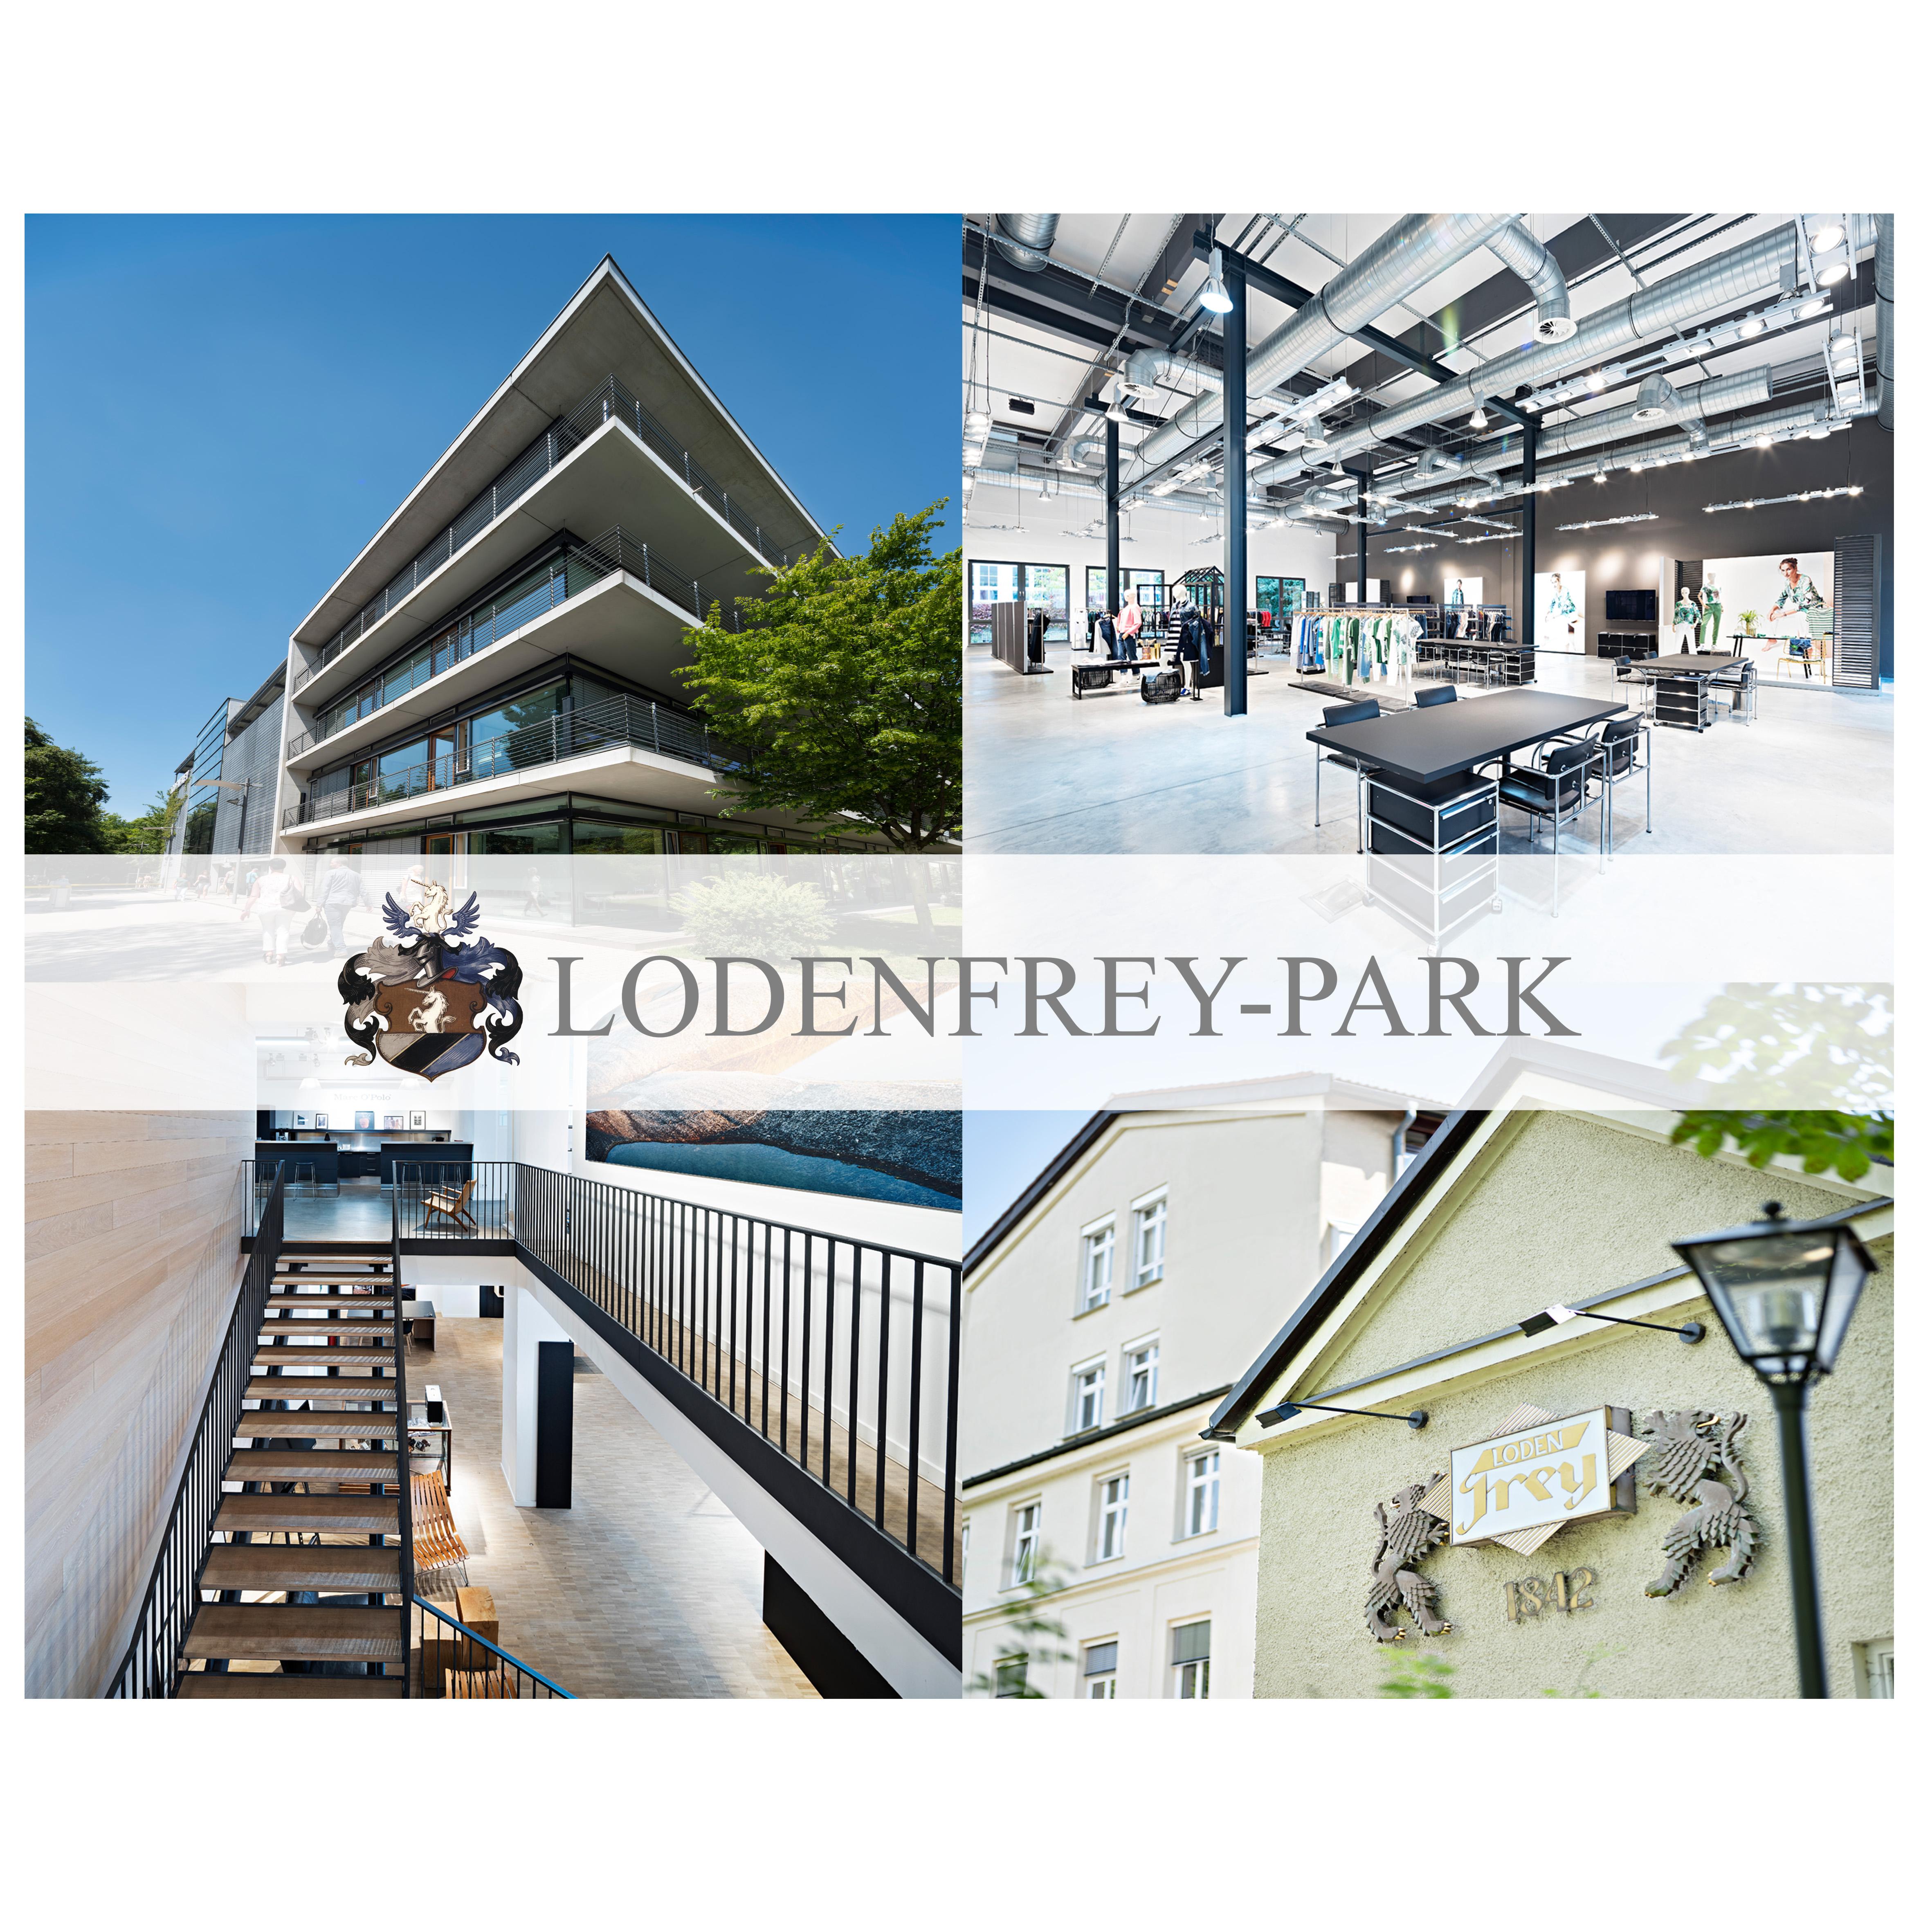 Neues Sujet - Lodenfrey-Park - kürzer Kopie